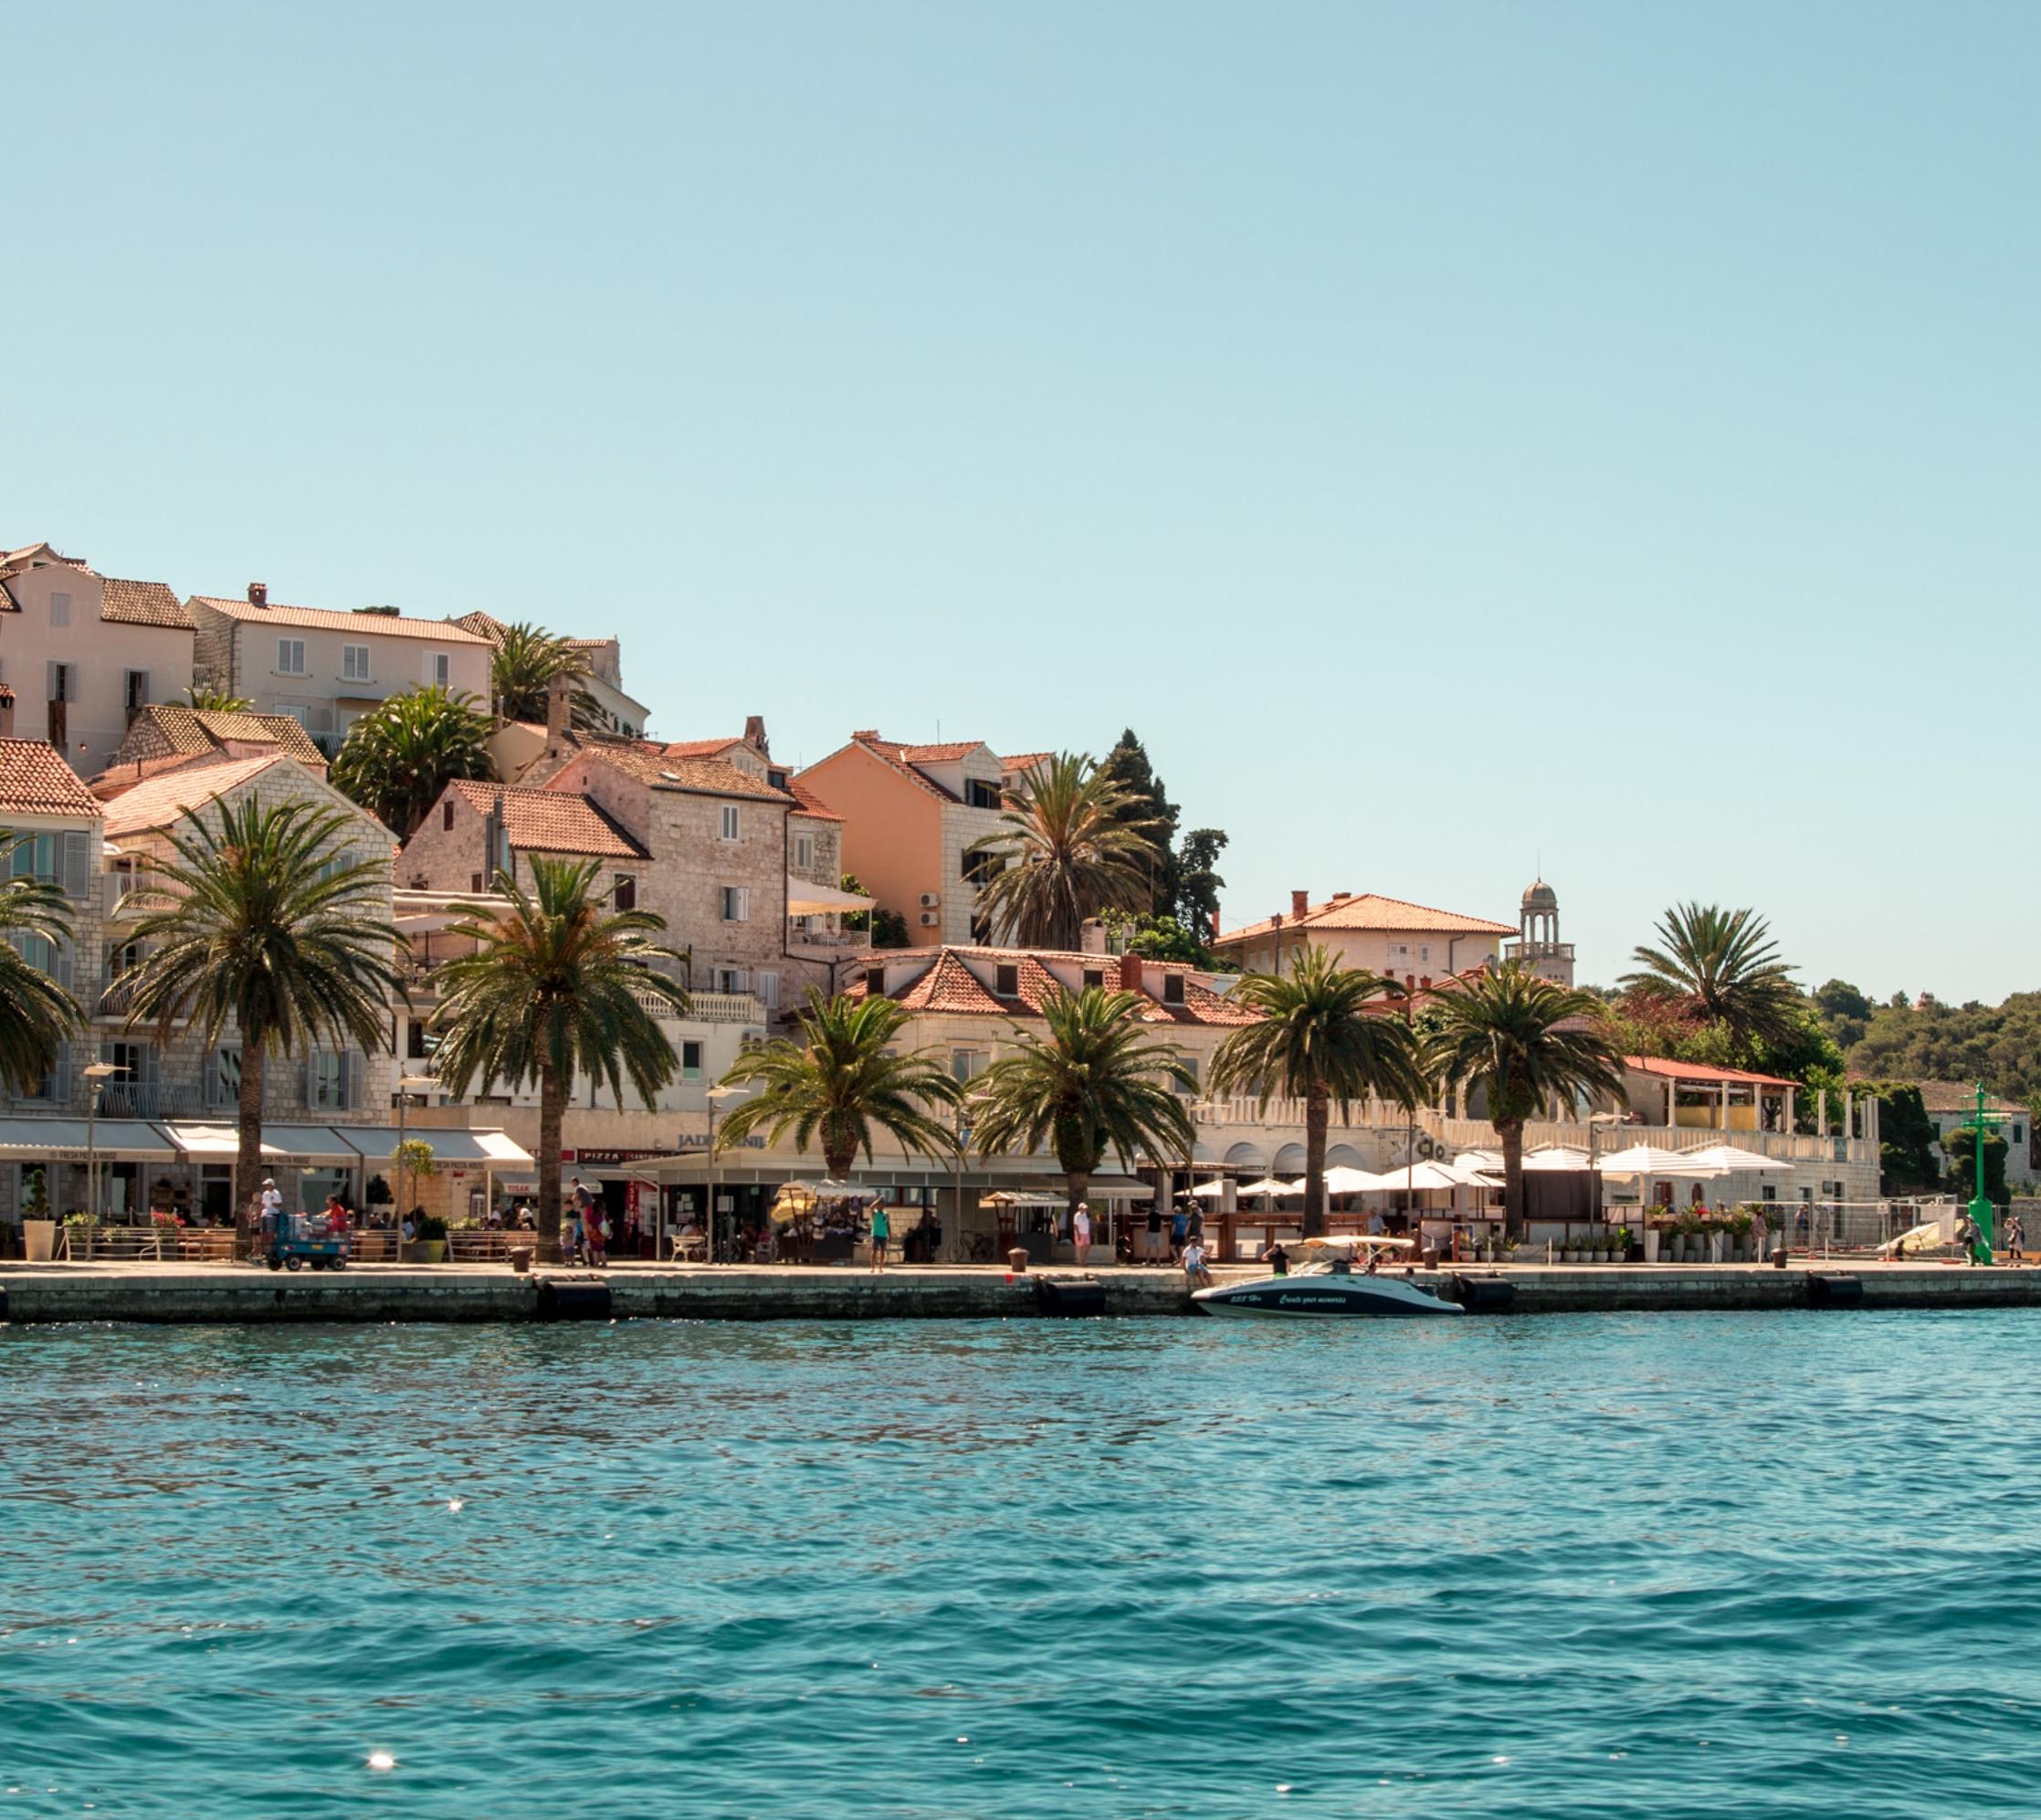 Adriatic Islands, Croatia